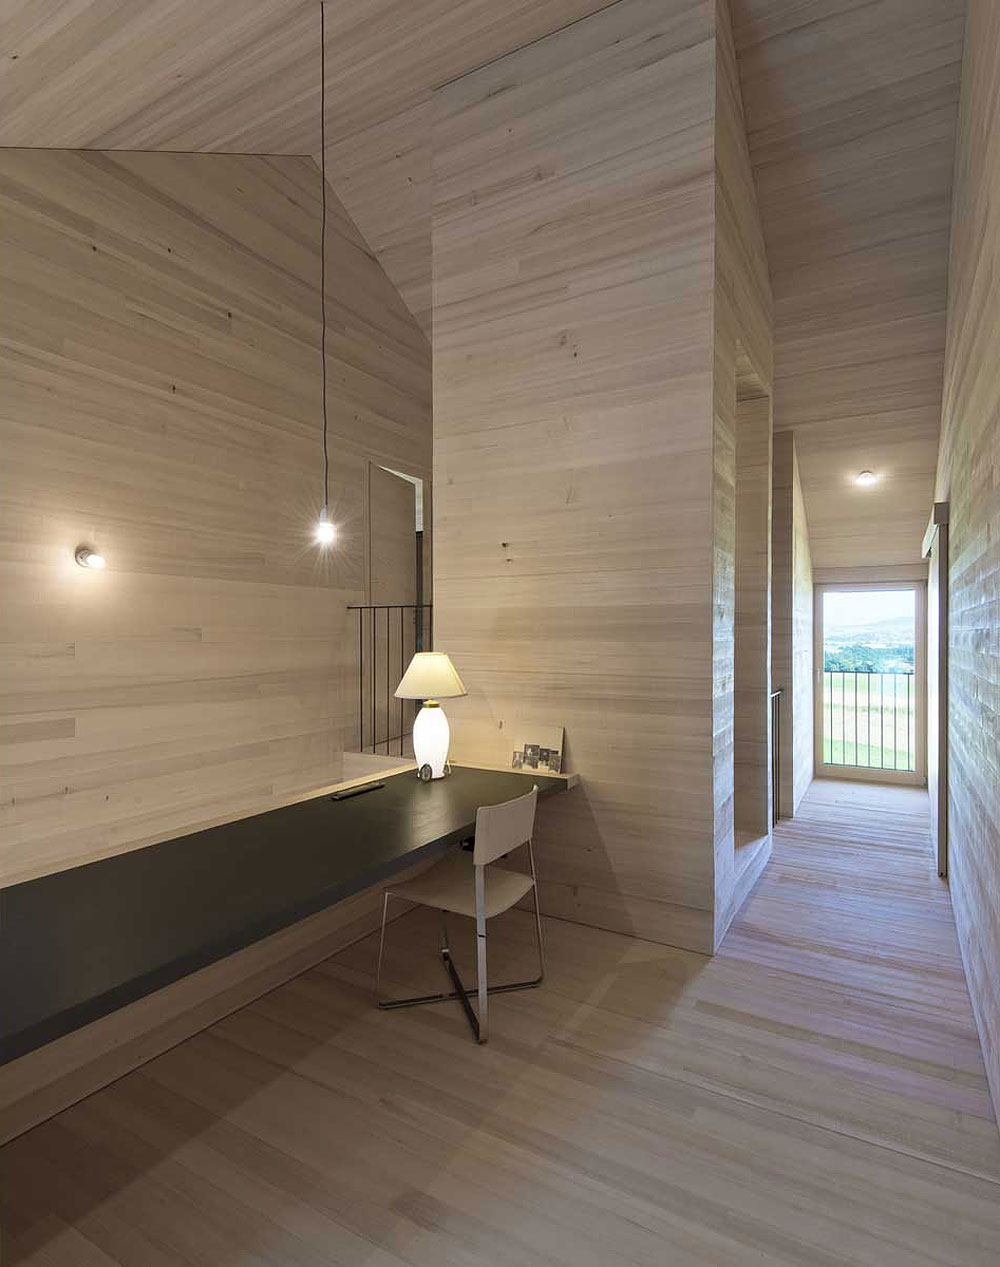 D. Residence by LP Architektur (9)